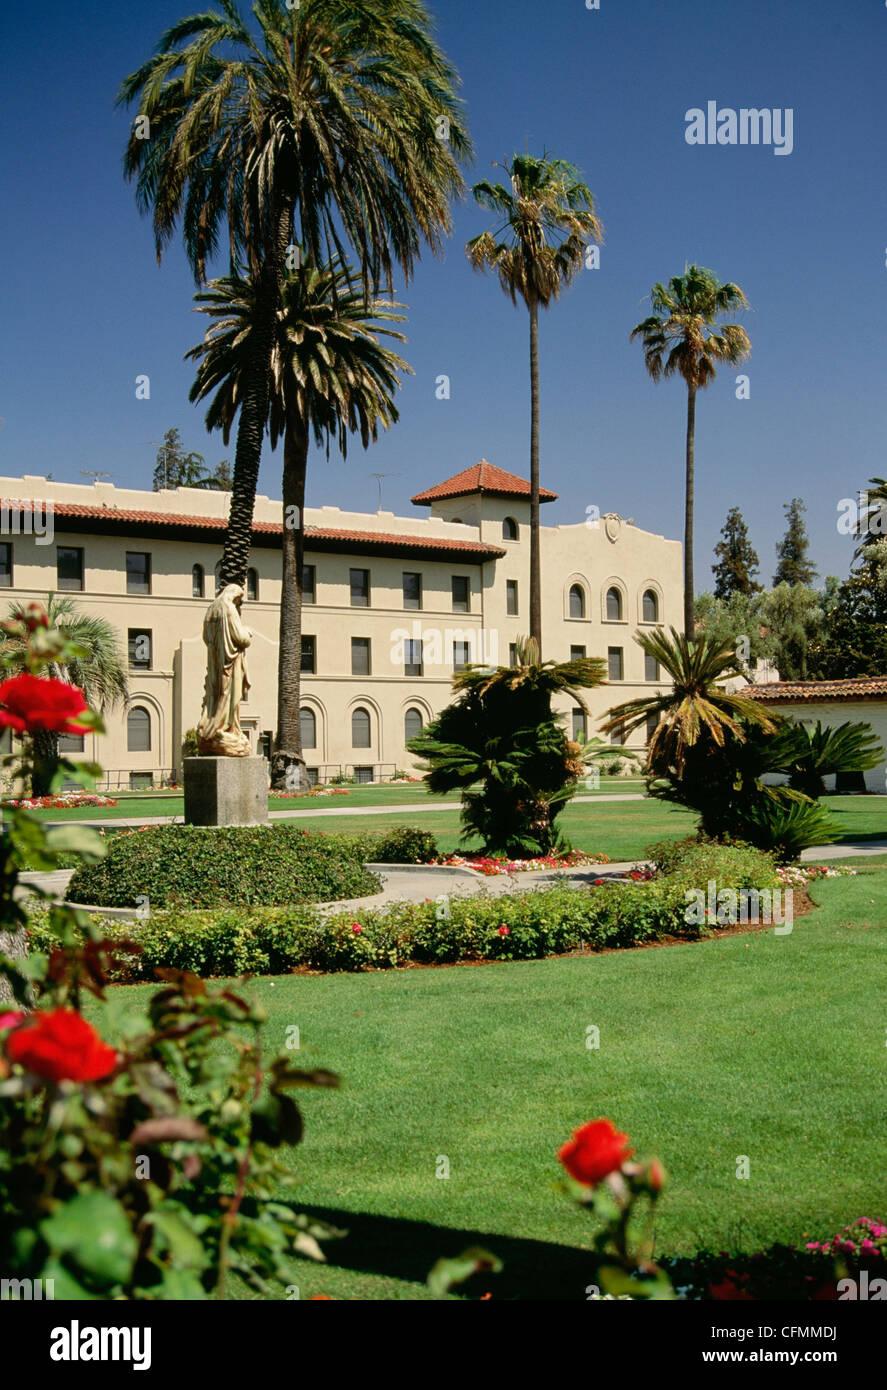 Santa Clara University Campus, Mission Gardens, CA